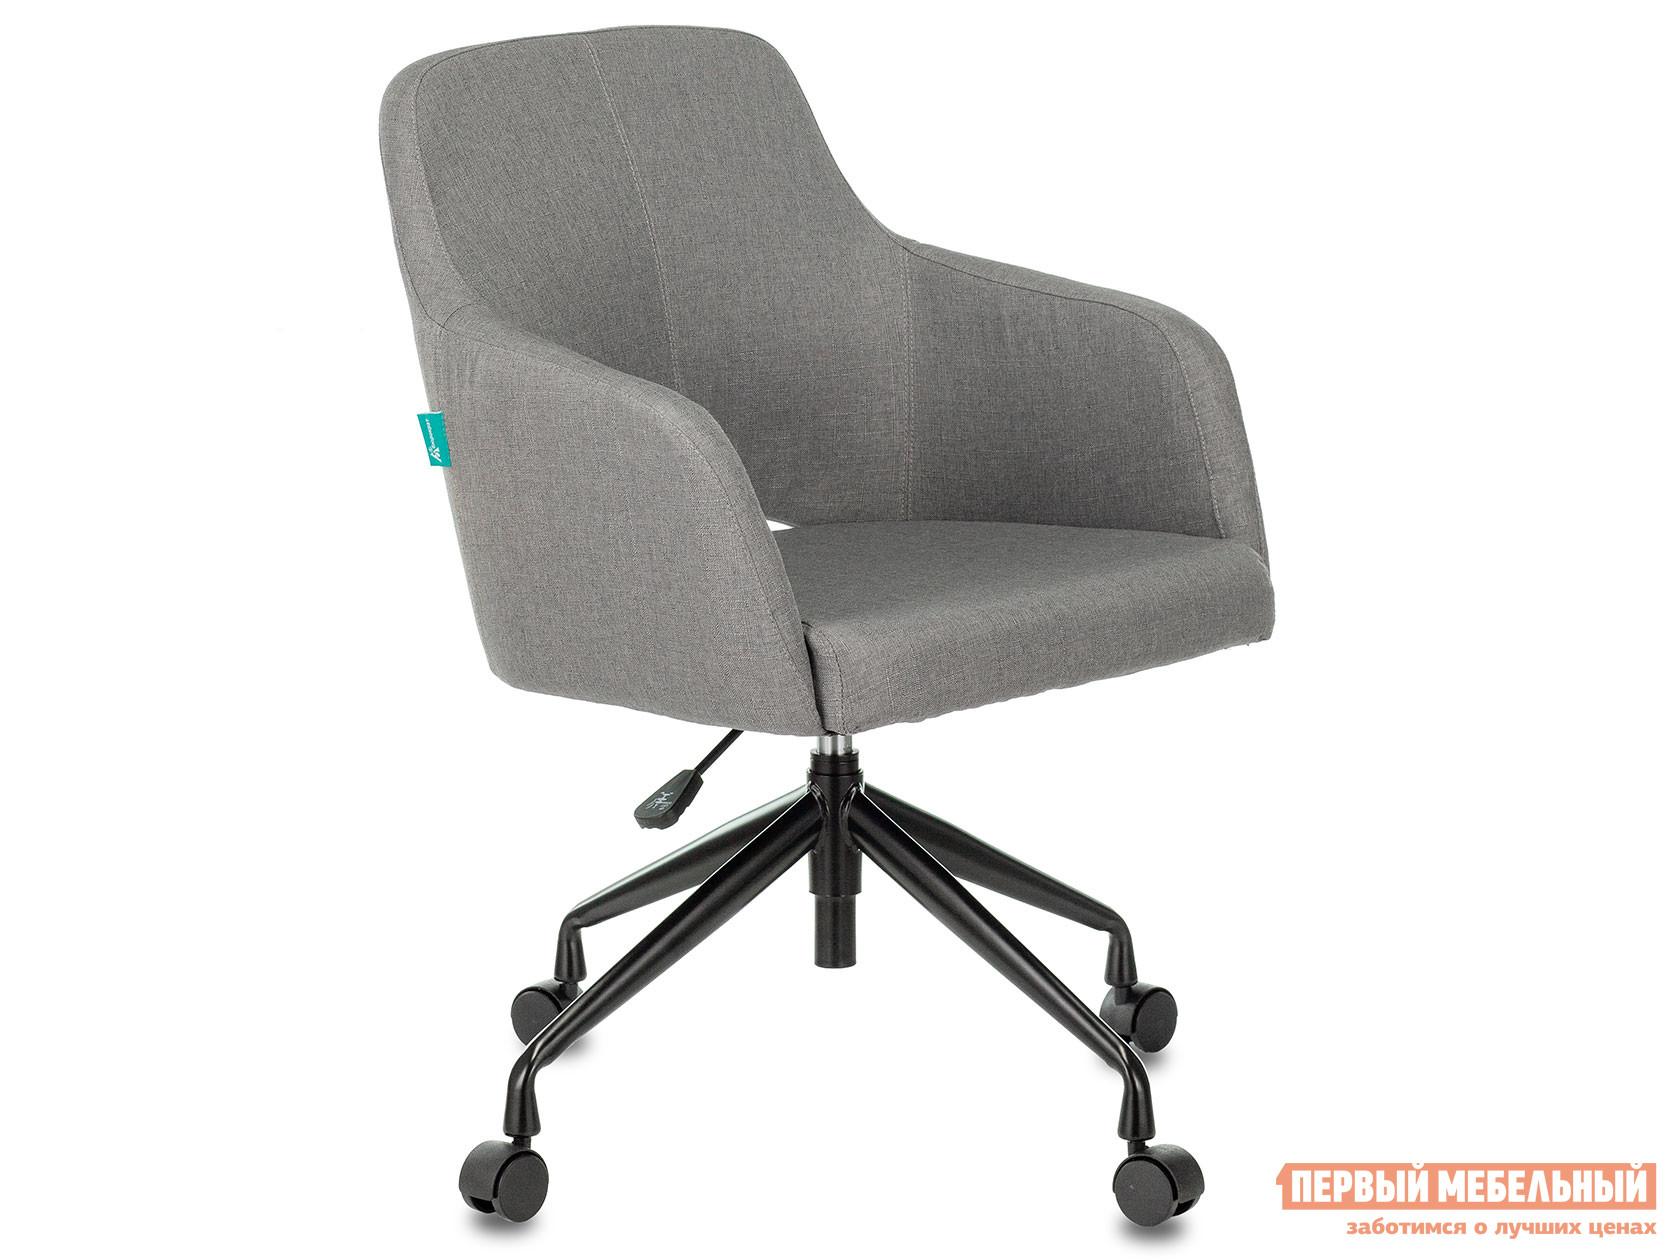 цена на Офисное кресло Бюрократ Кресло Бюрократ CH-380